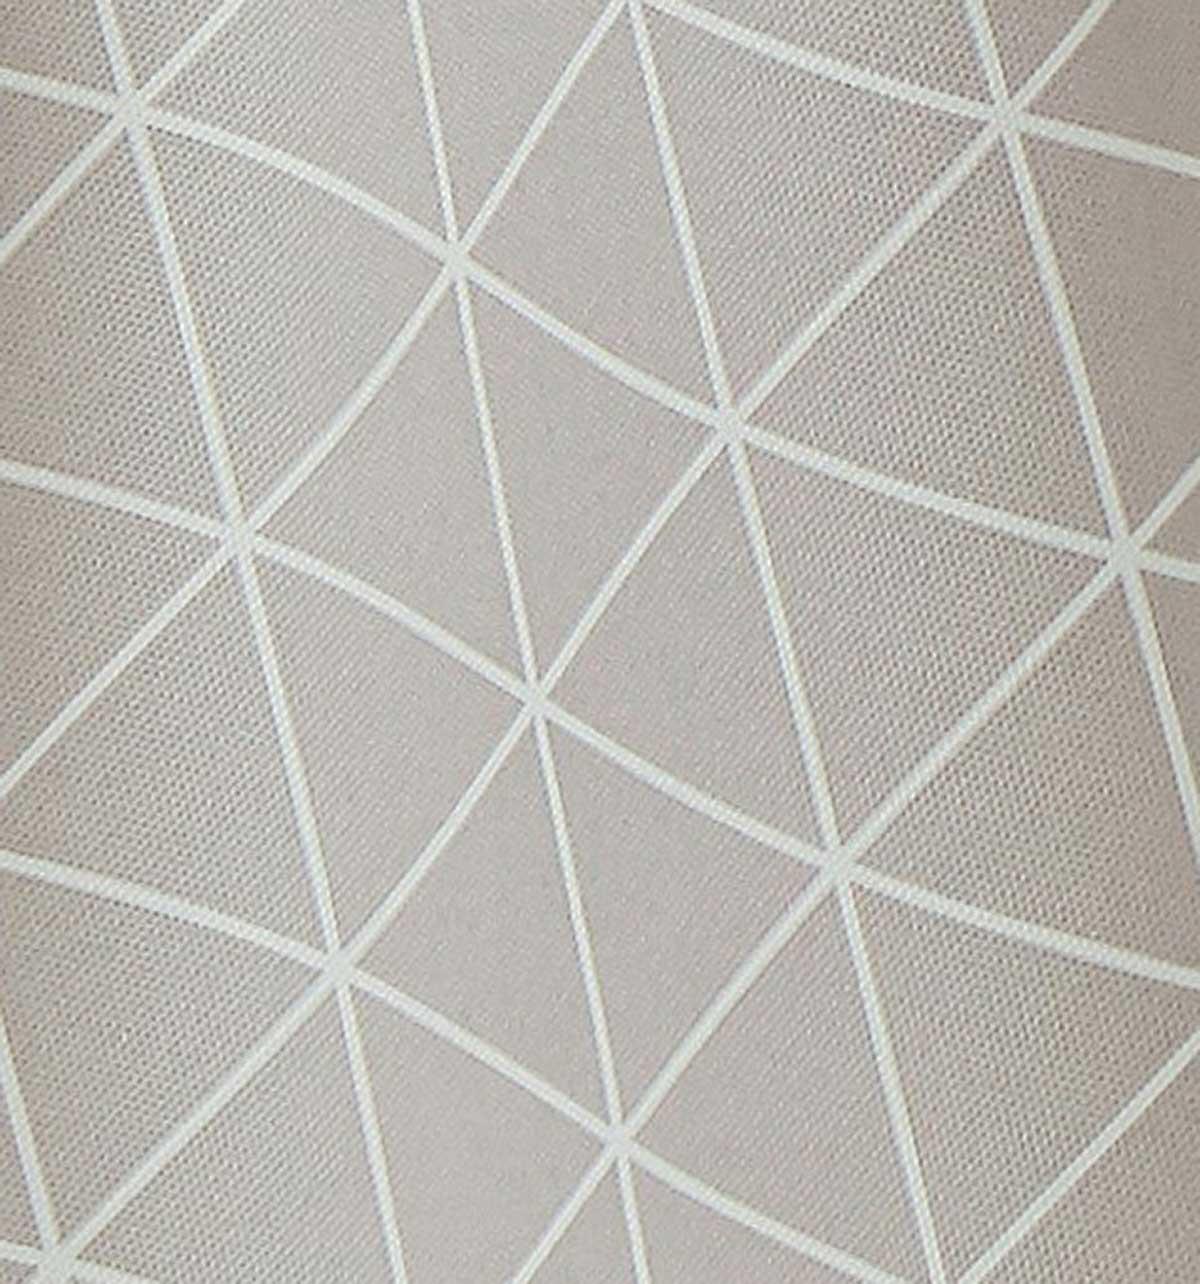 Nappe Ovale Scandinave - Beige - 180 x 240 cm